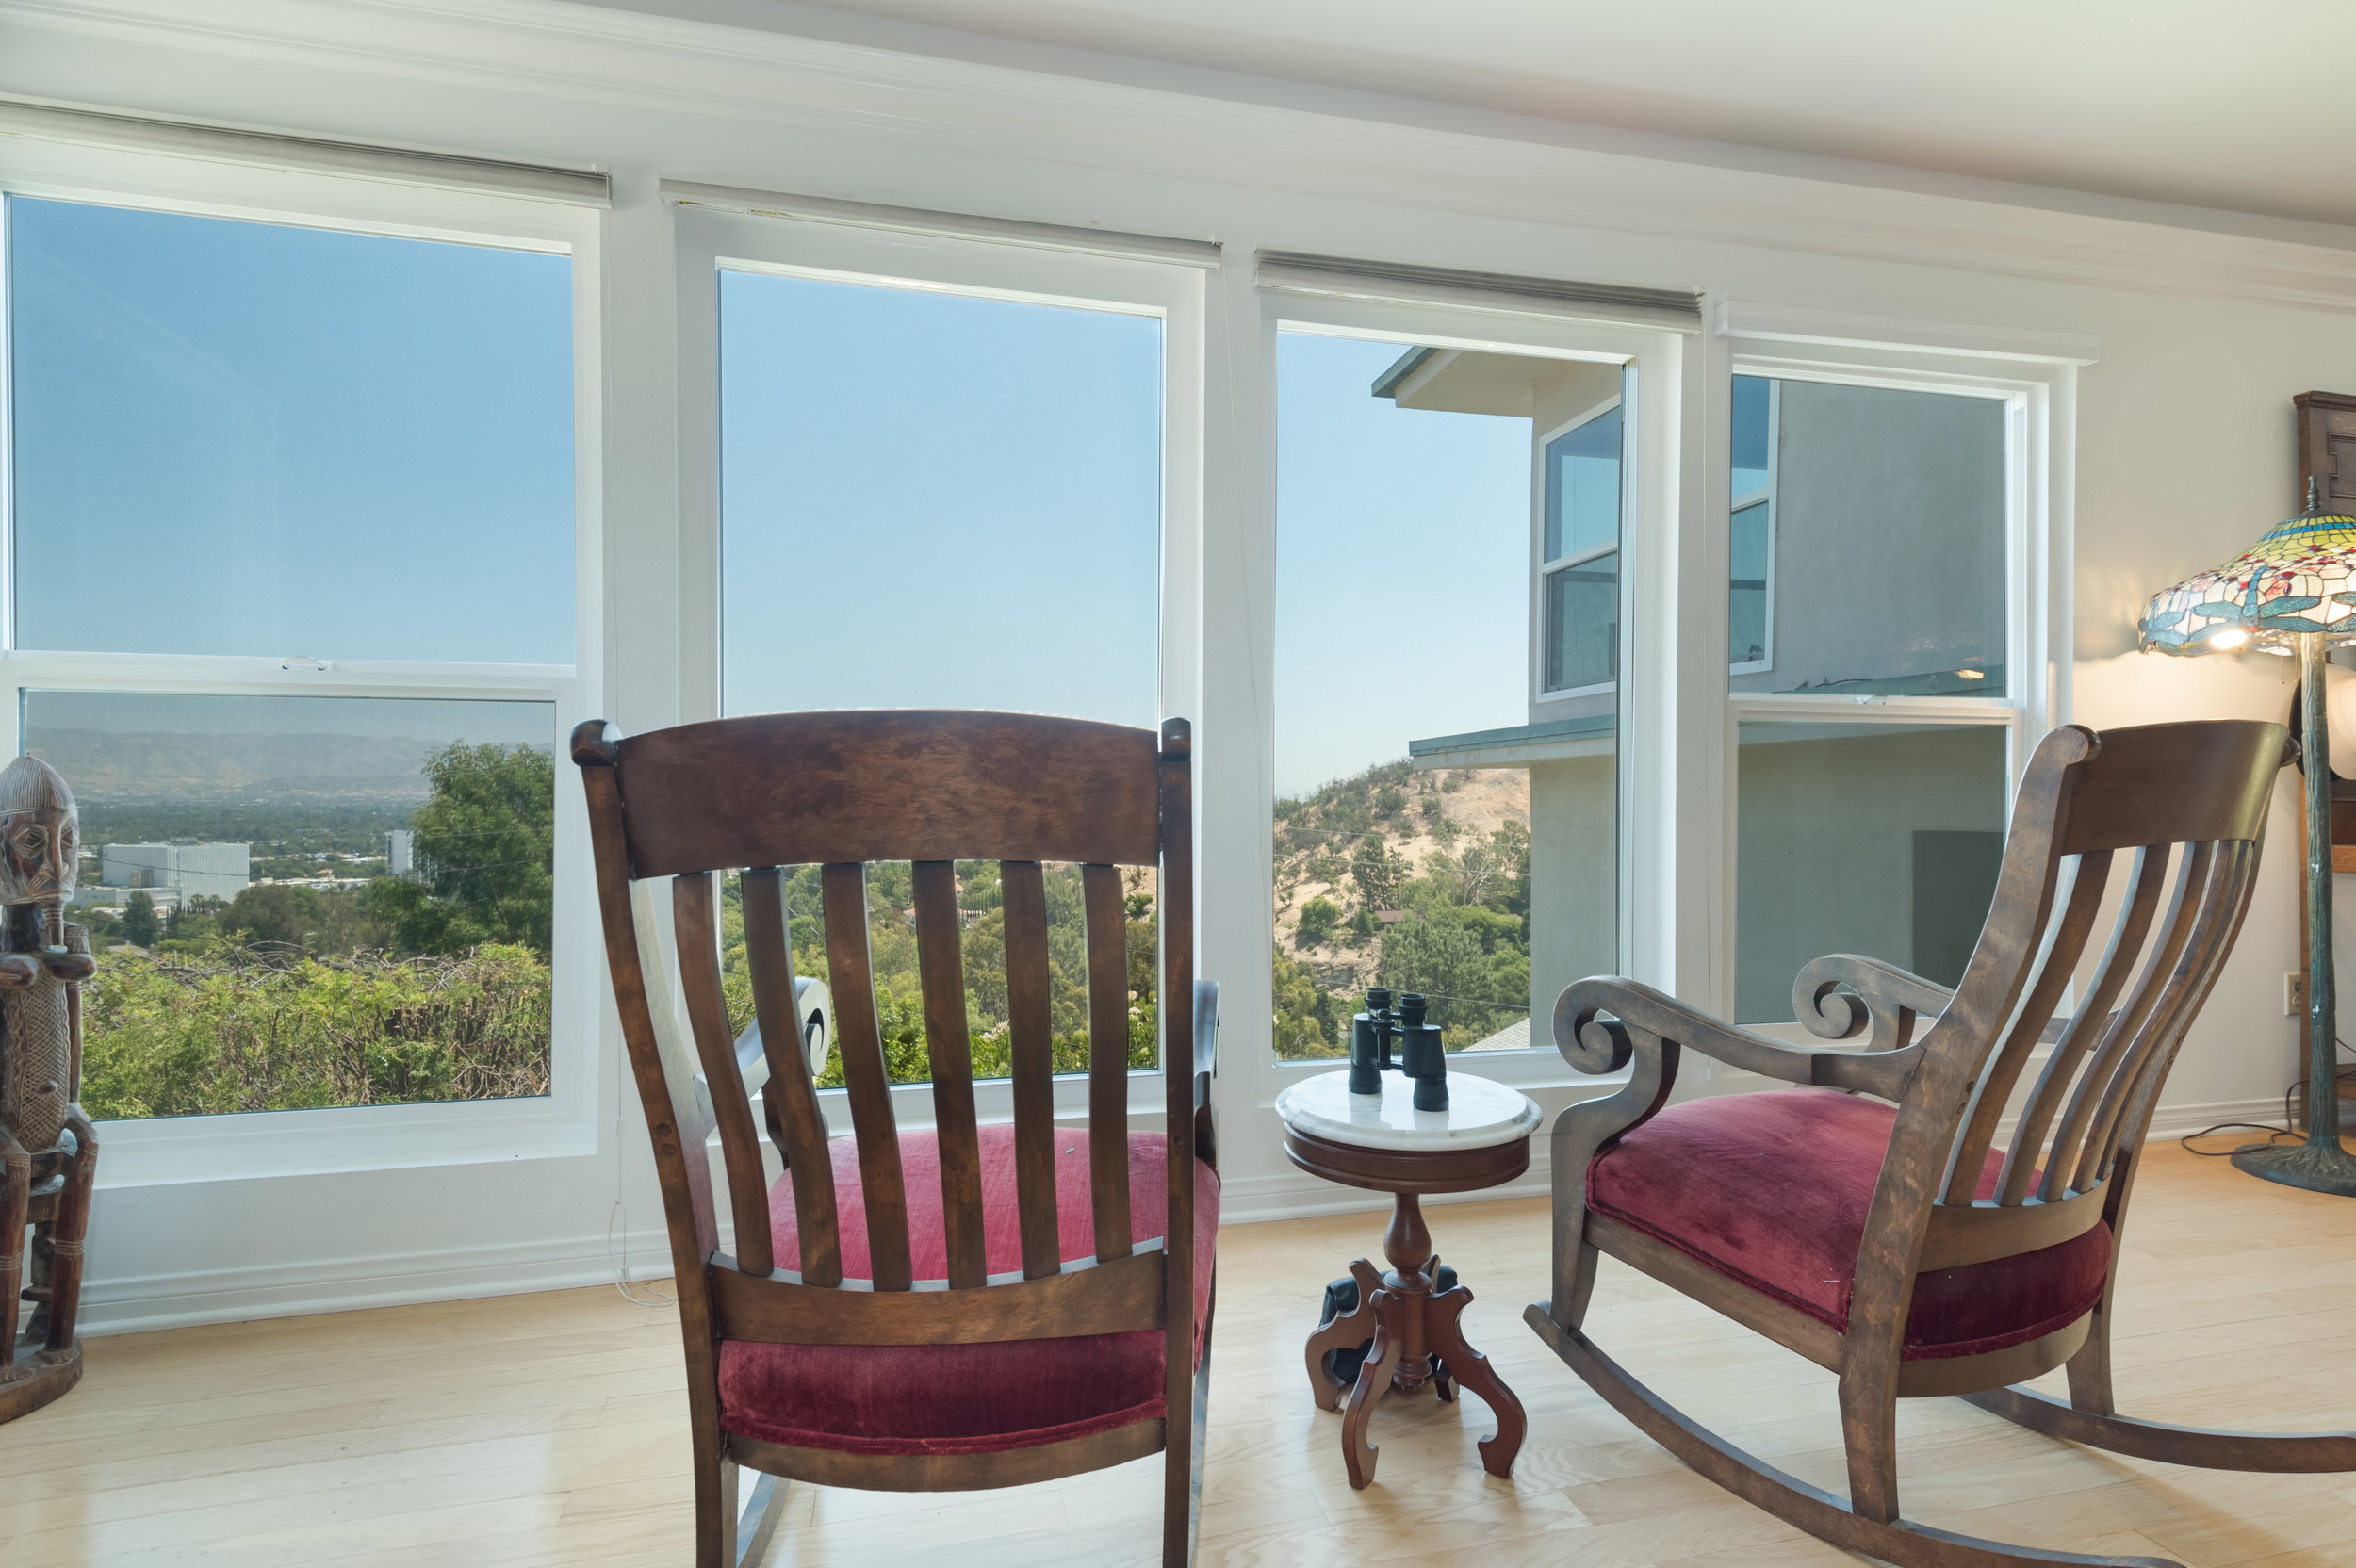 001.2 Living Room 15072 Rayneta Sherman Oaks For Sale The Malibu Life Team Luxury Real Estate.jpg